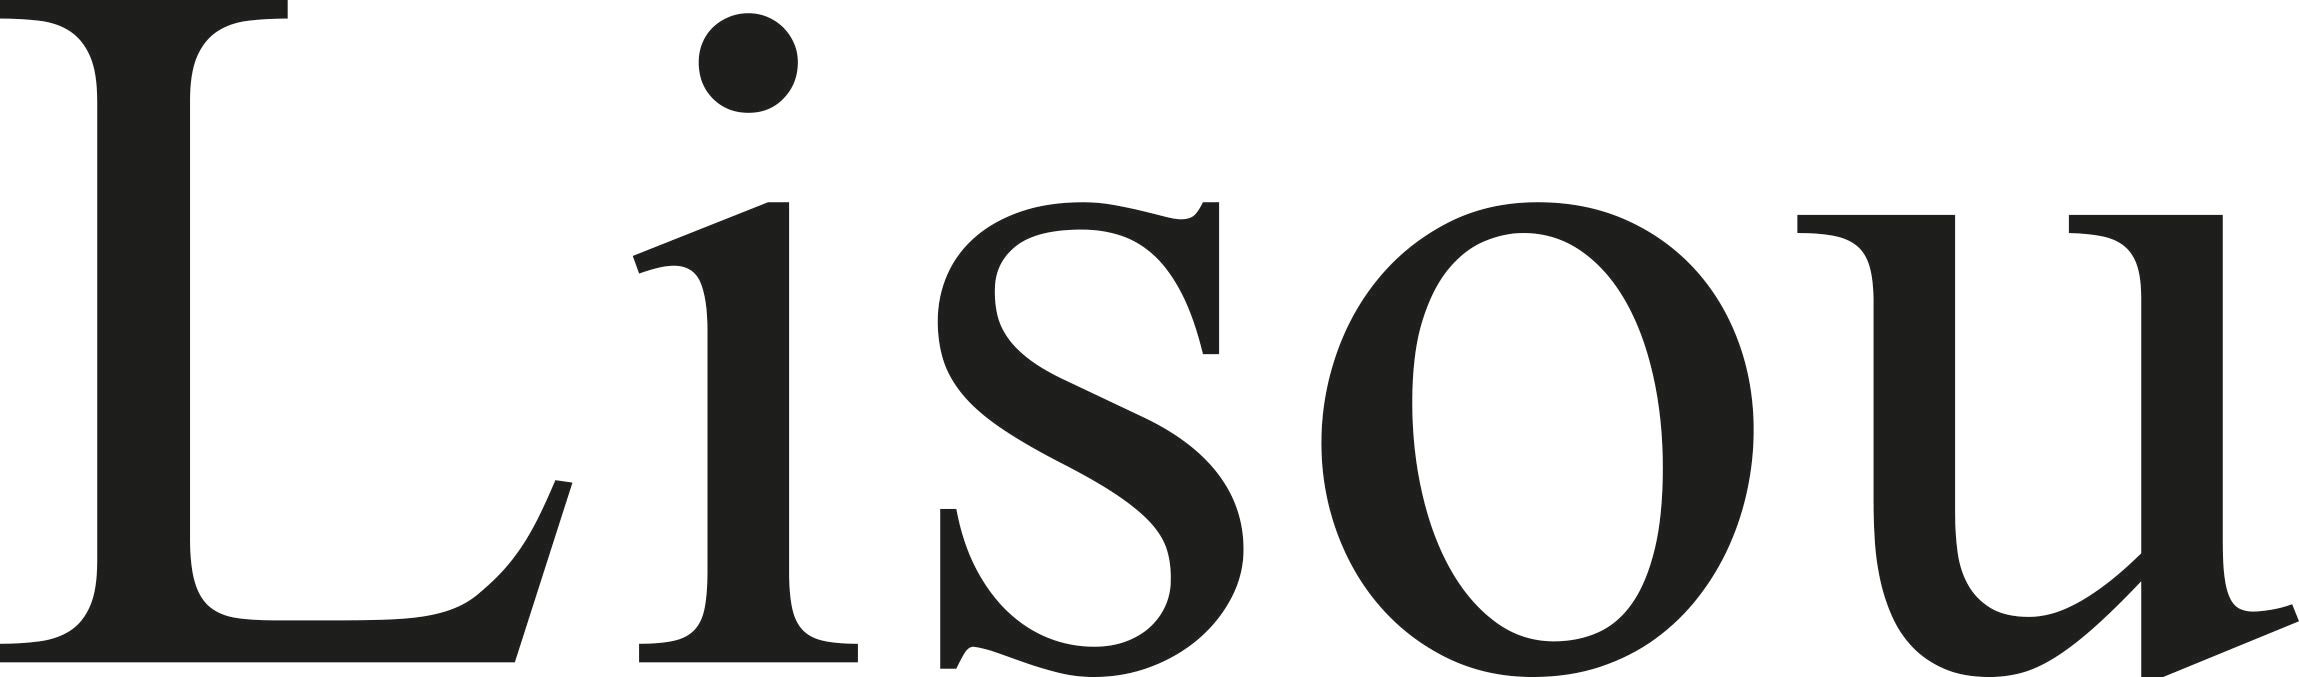 Lisou-LogoMaster-Black.jpg